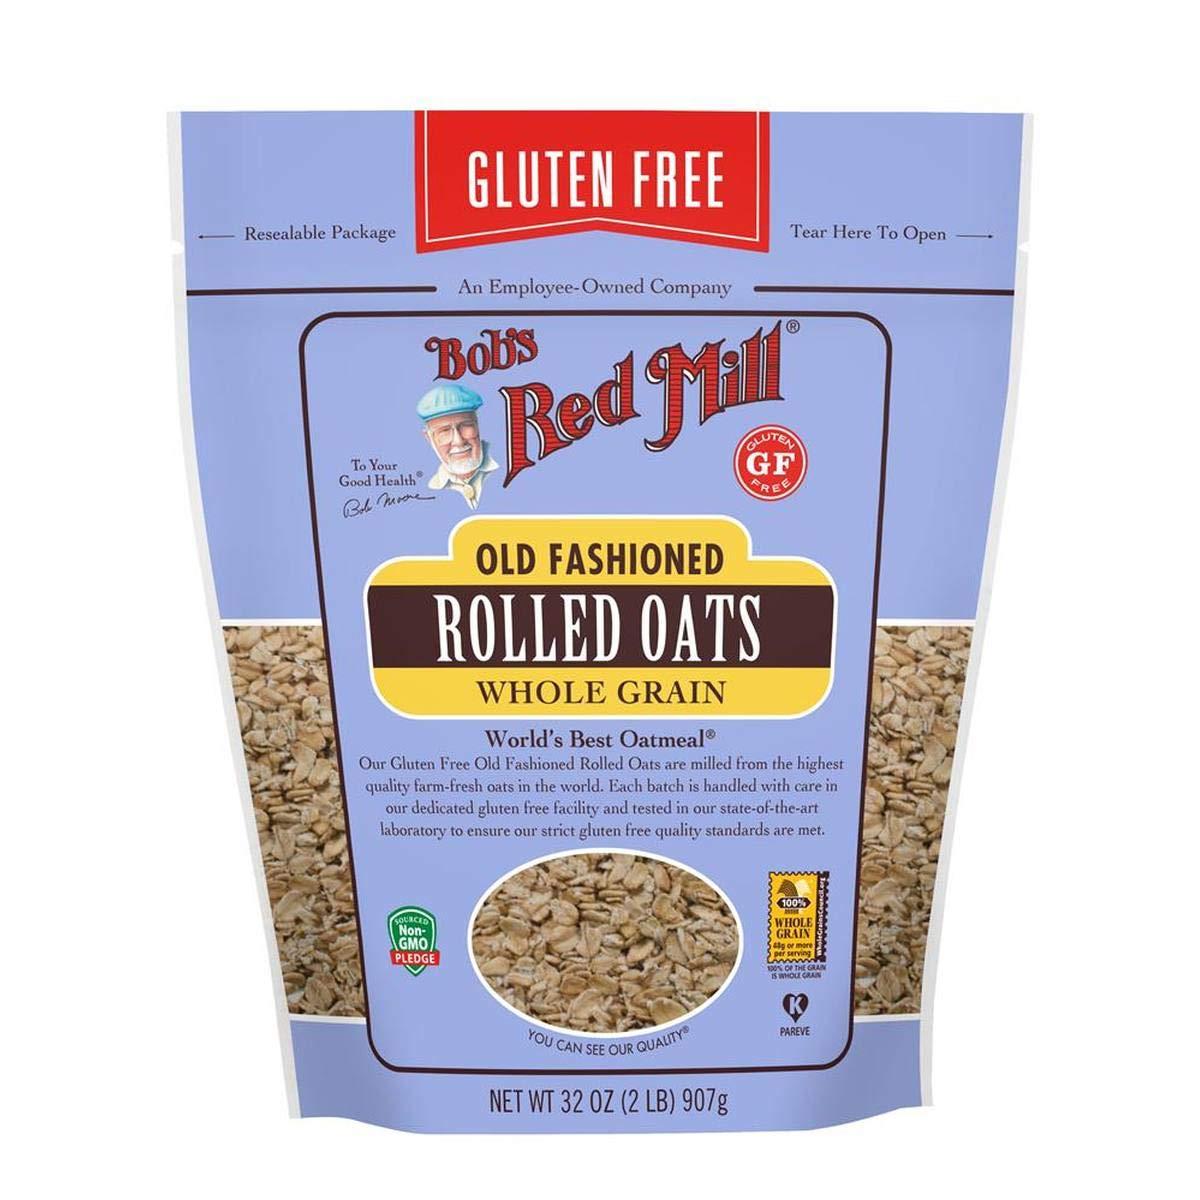 Copos de avena de Bob Red Mill sin gluten, grano entero, 32 ...